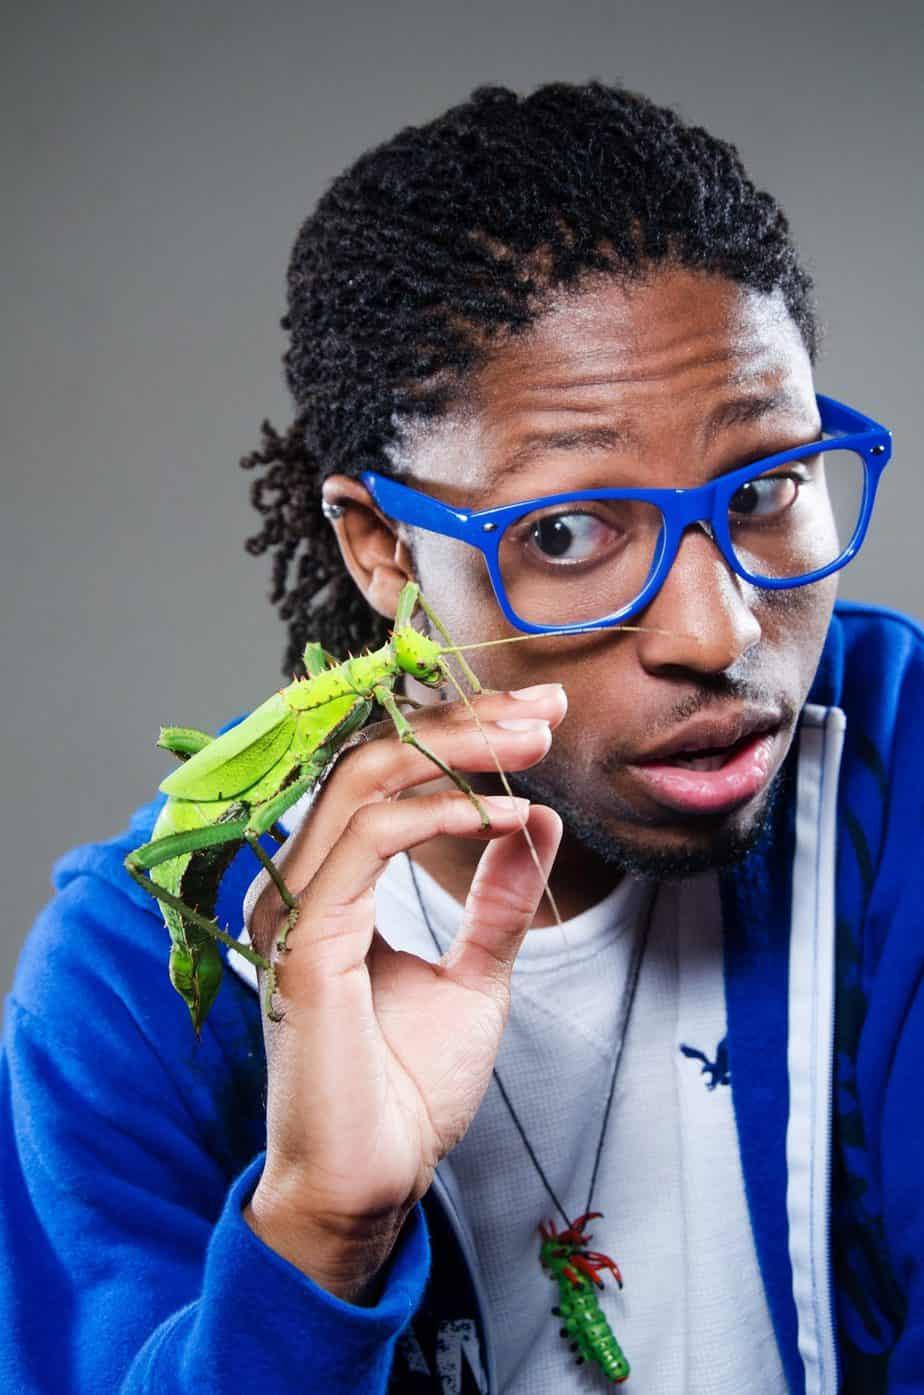 Dr. Sammy with bug